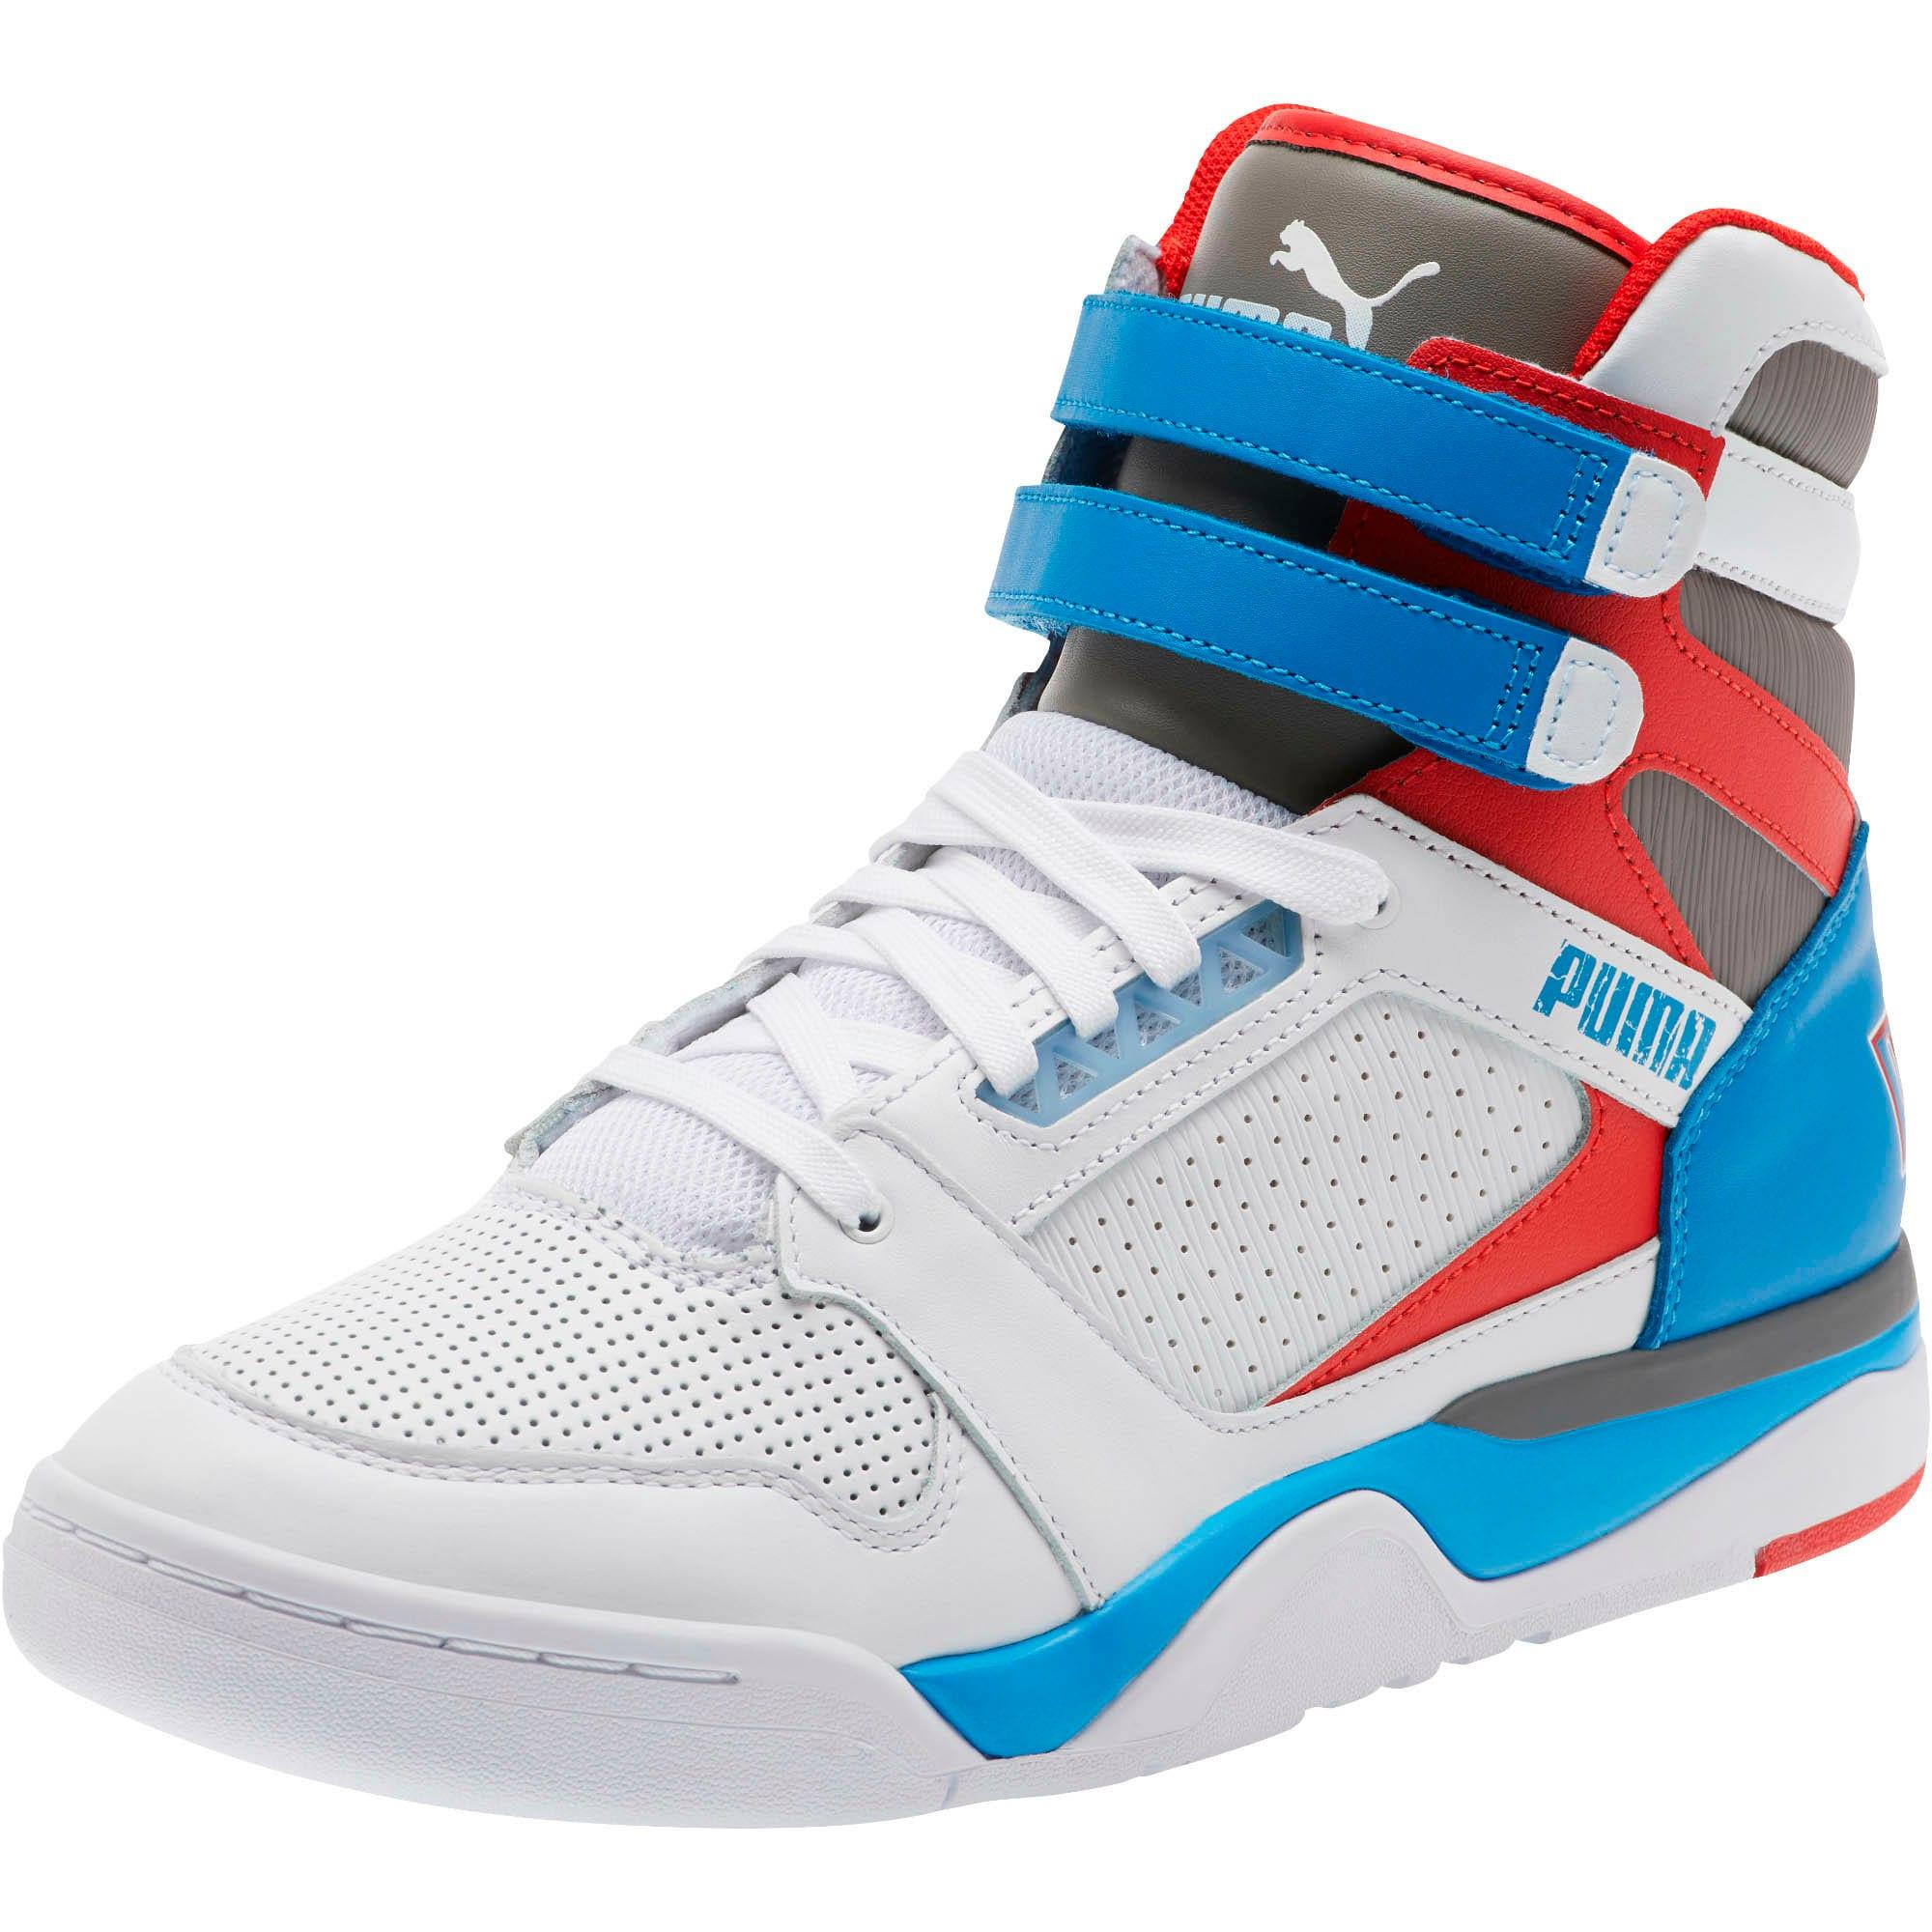 Thumbnail 1 of Palace Guard Mid Retro Sneakers, White-Indigo Bunting-Red, medium